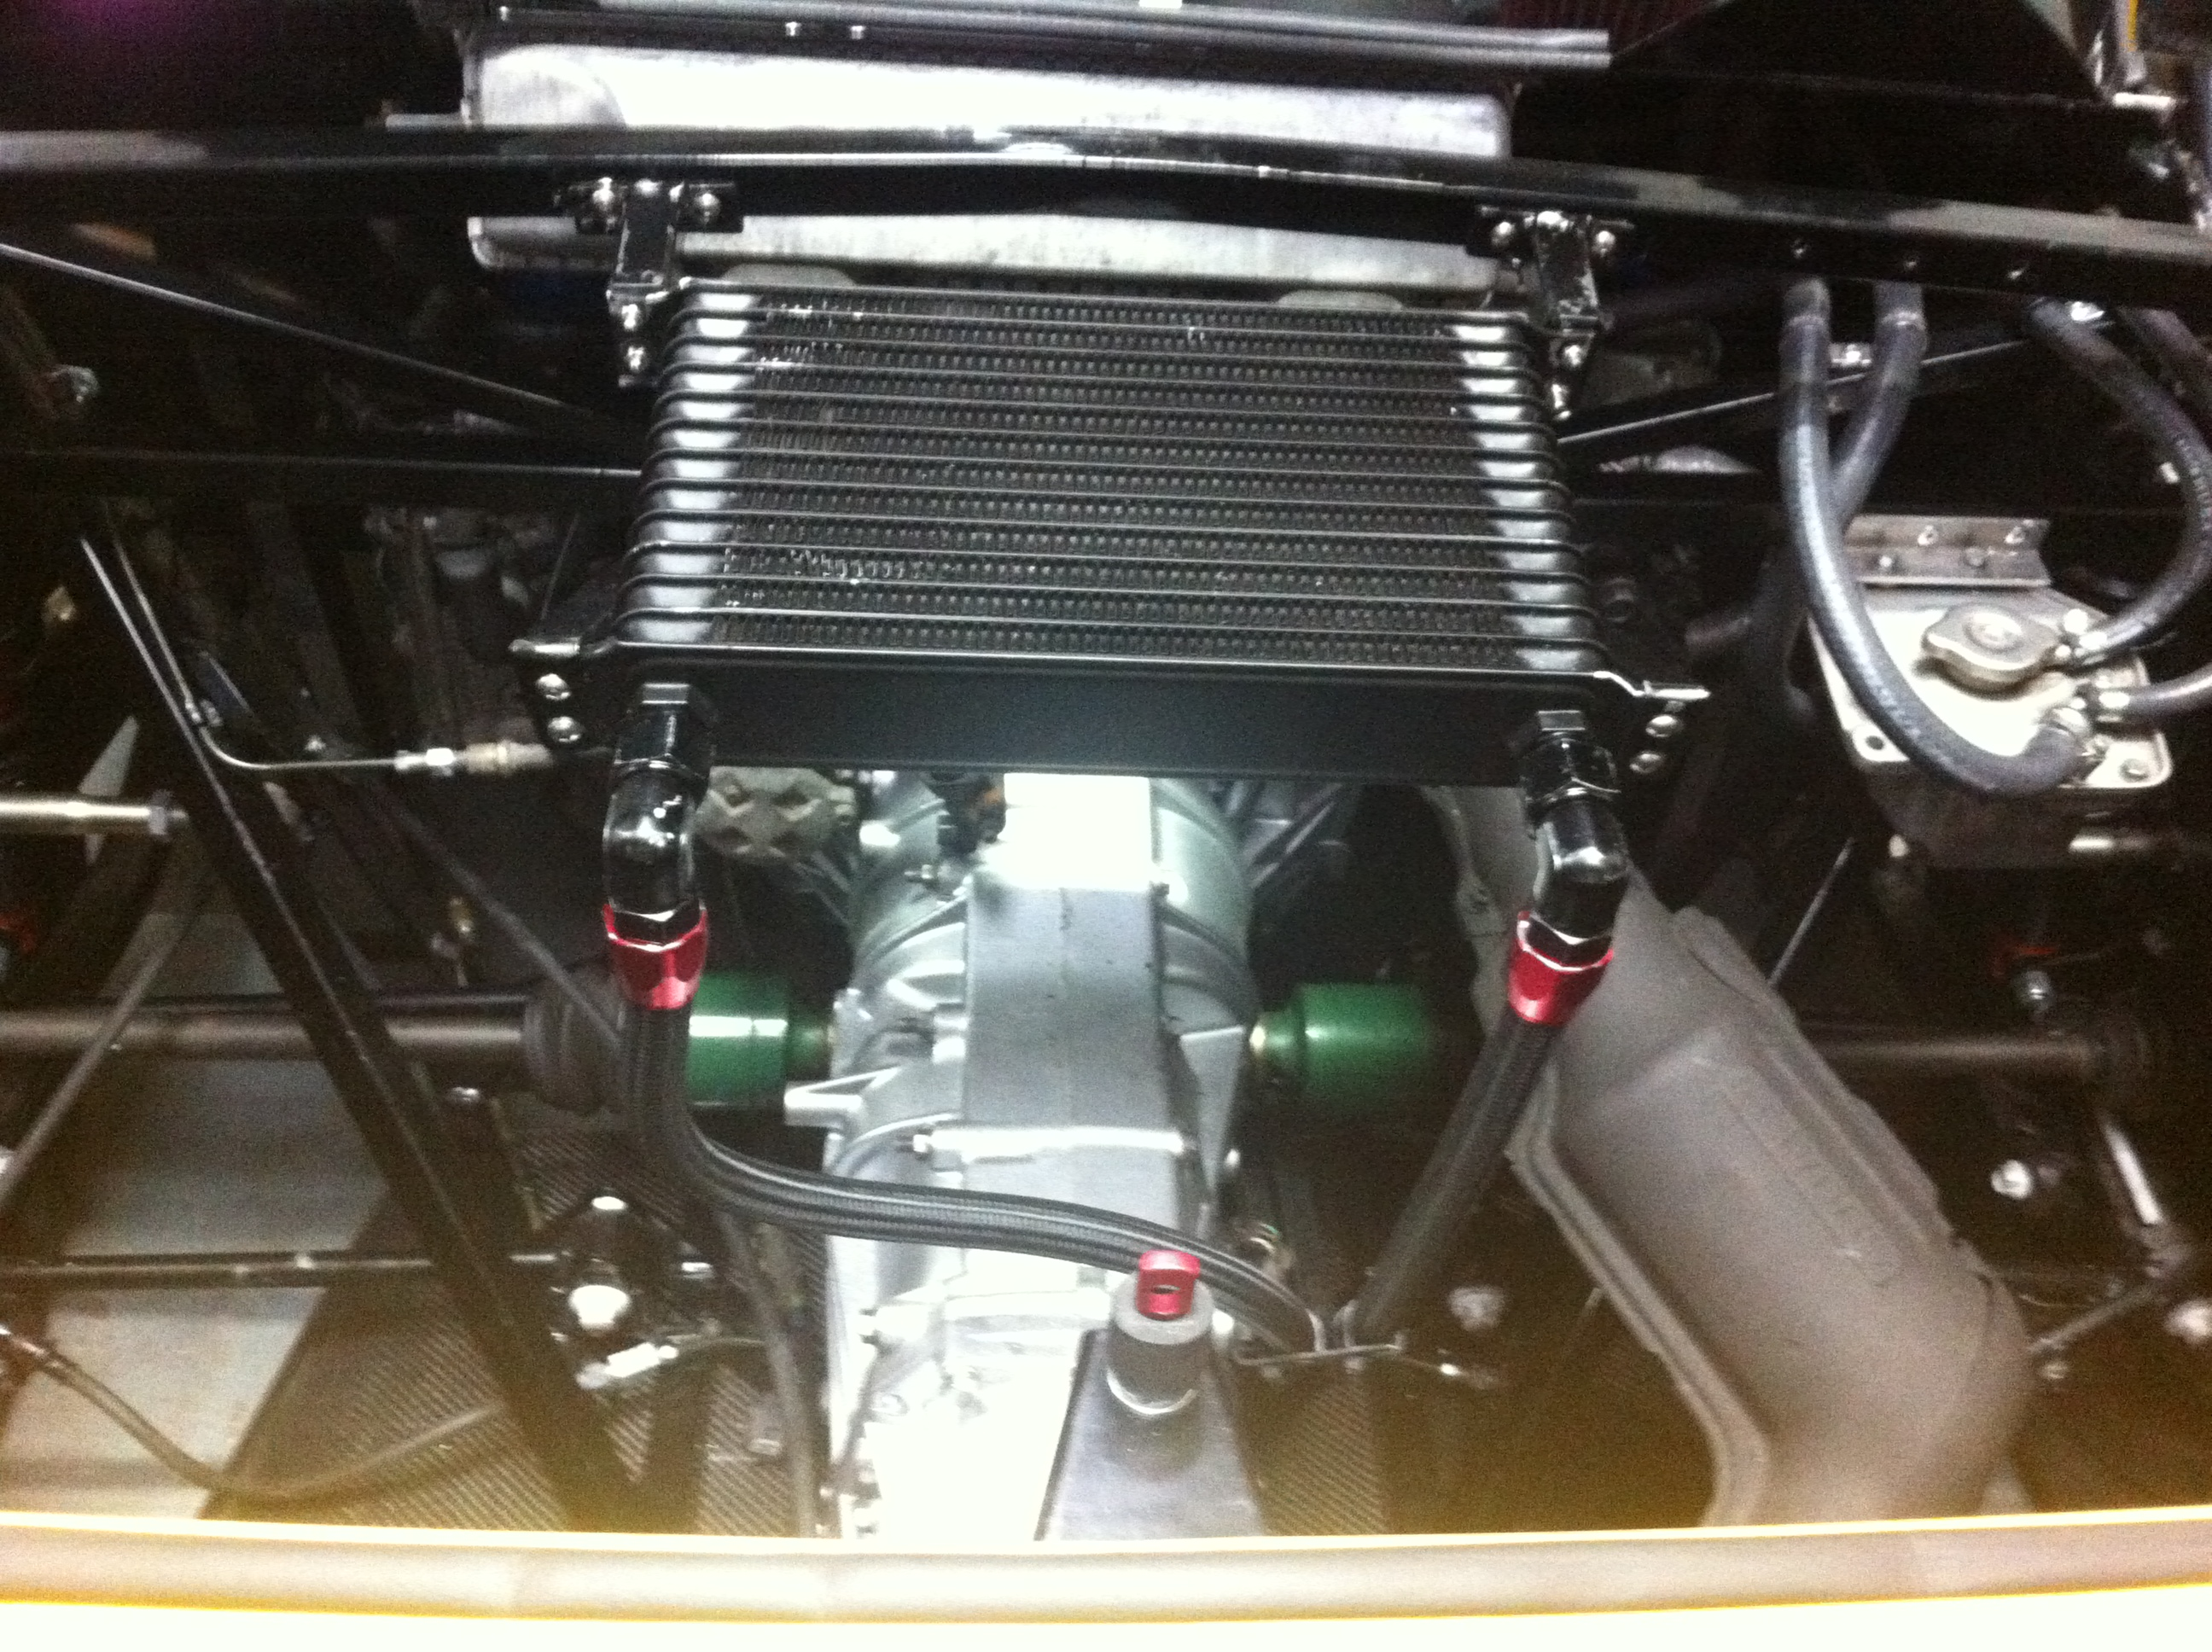 Subaru 2.5 Ltr Flat Four Boxer